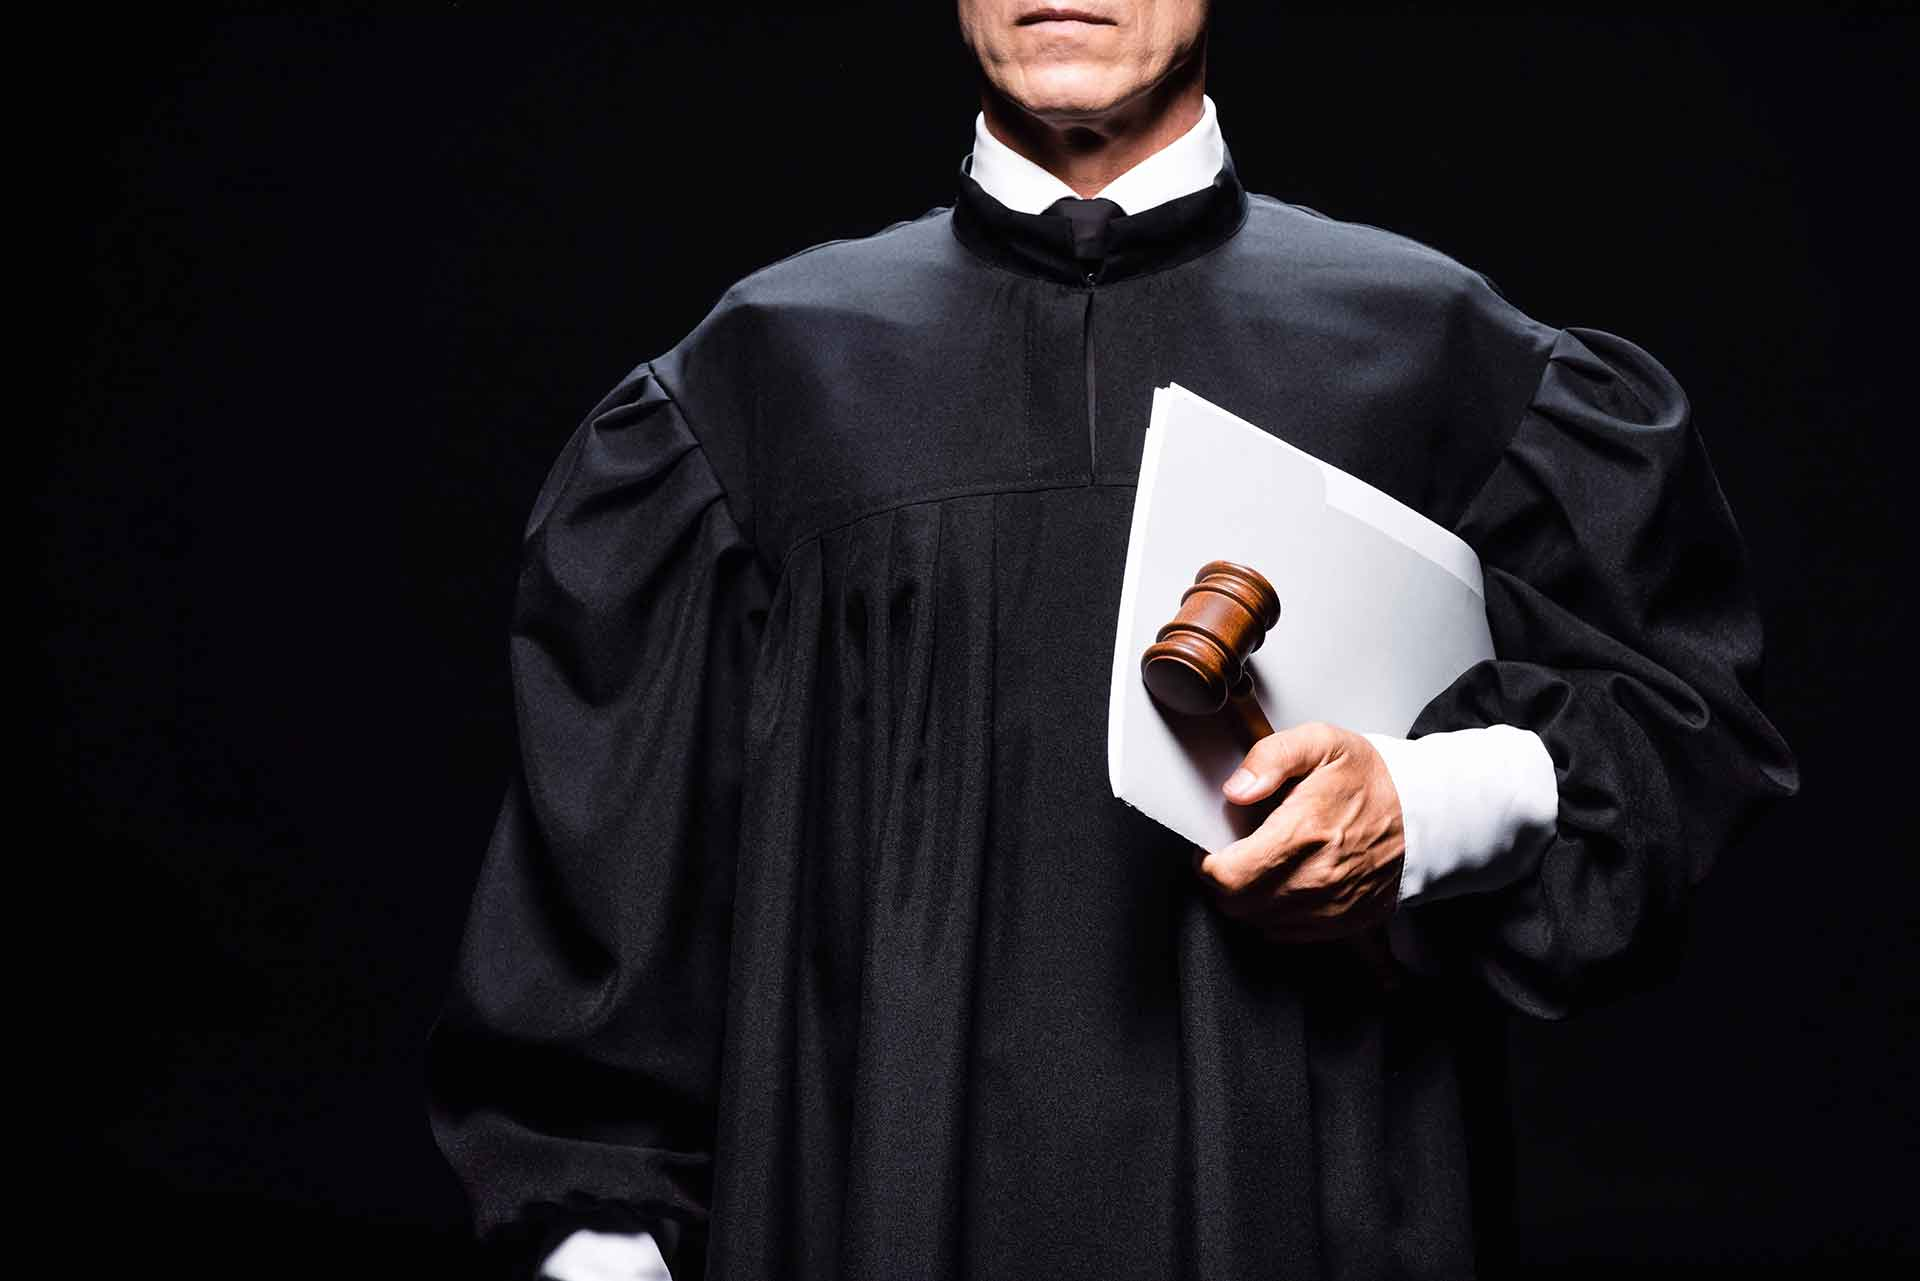 Privacyverklaring strafrecht advocaat - Weening Strafrechtadvocaten